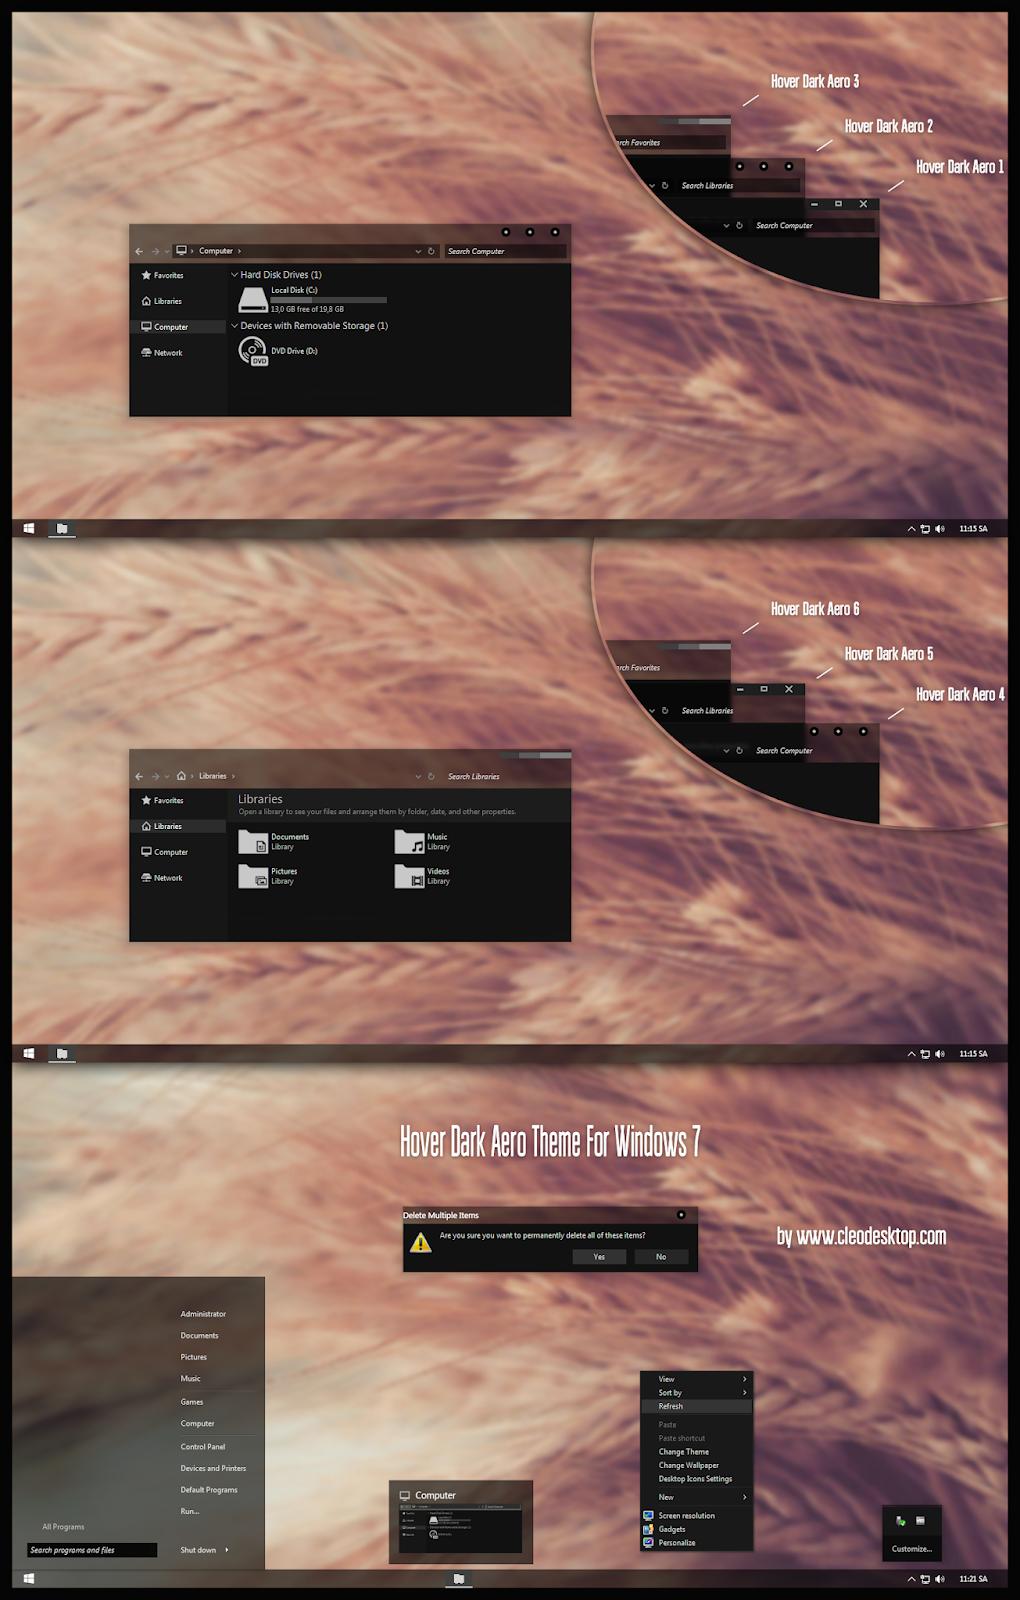 Windows10 Themes I Cleodesktop: Hover Dark Aero Theme For